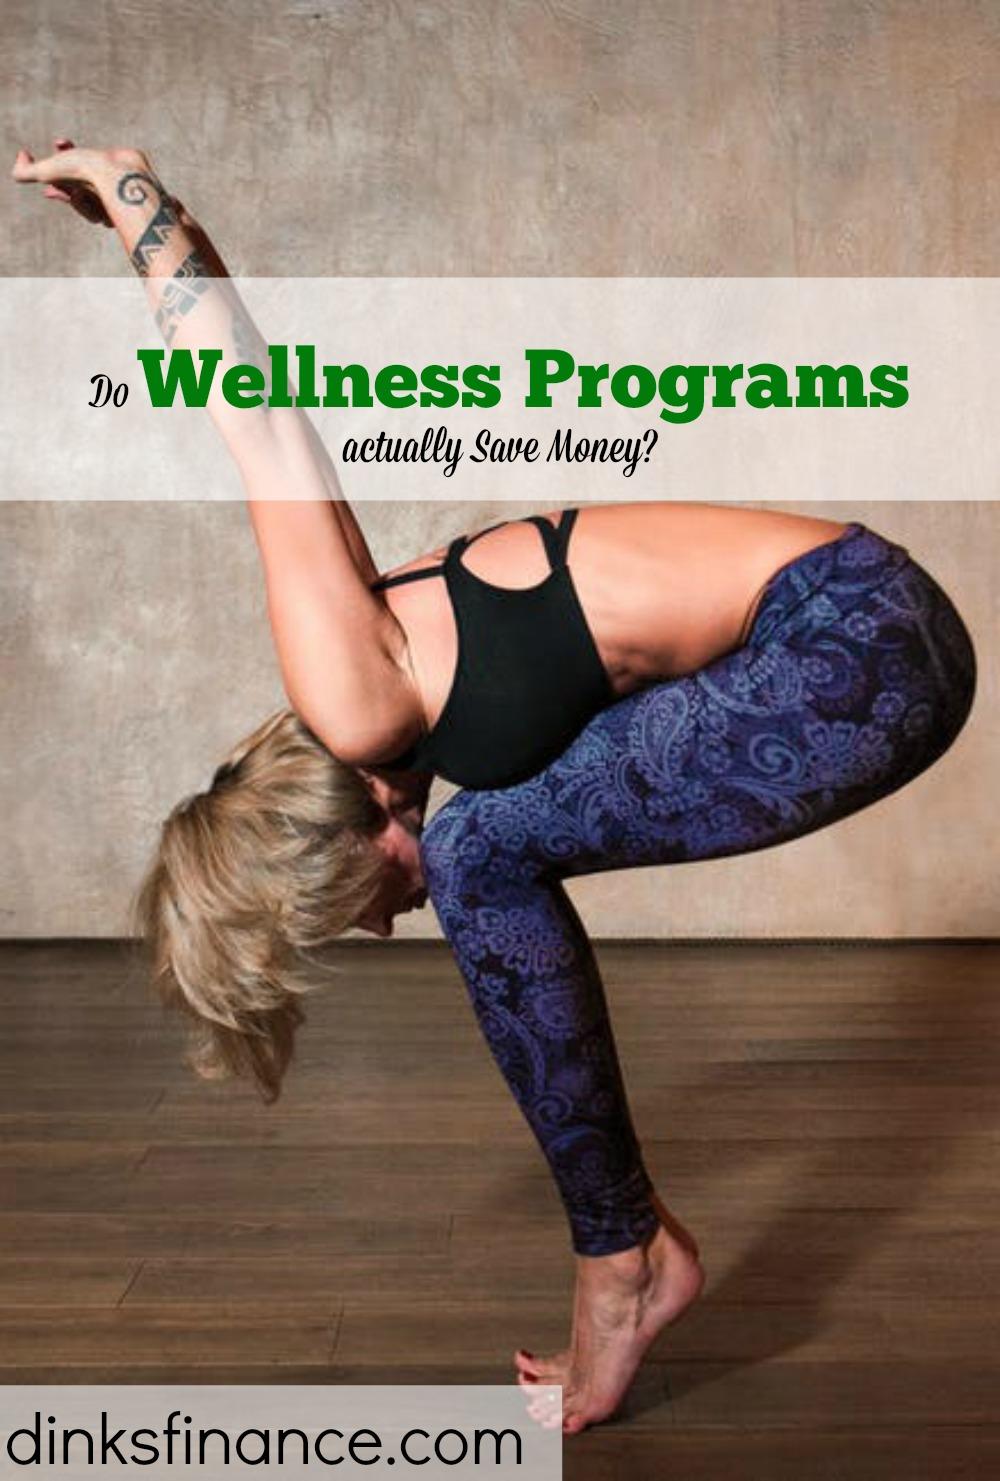 company wellness programs, getting healthy, saving money through wellness programs